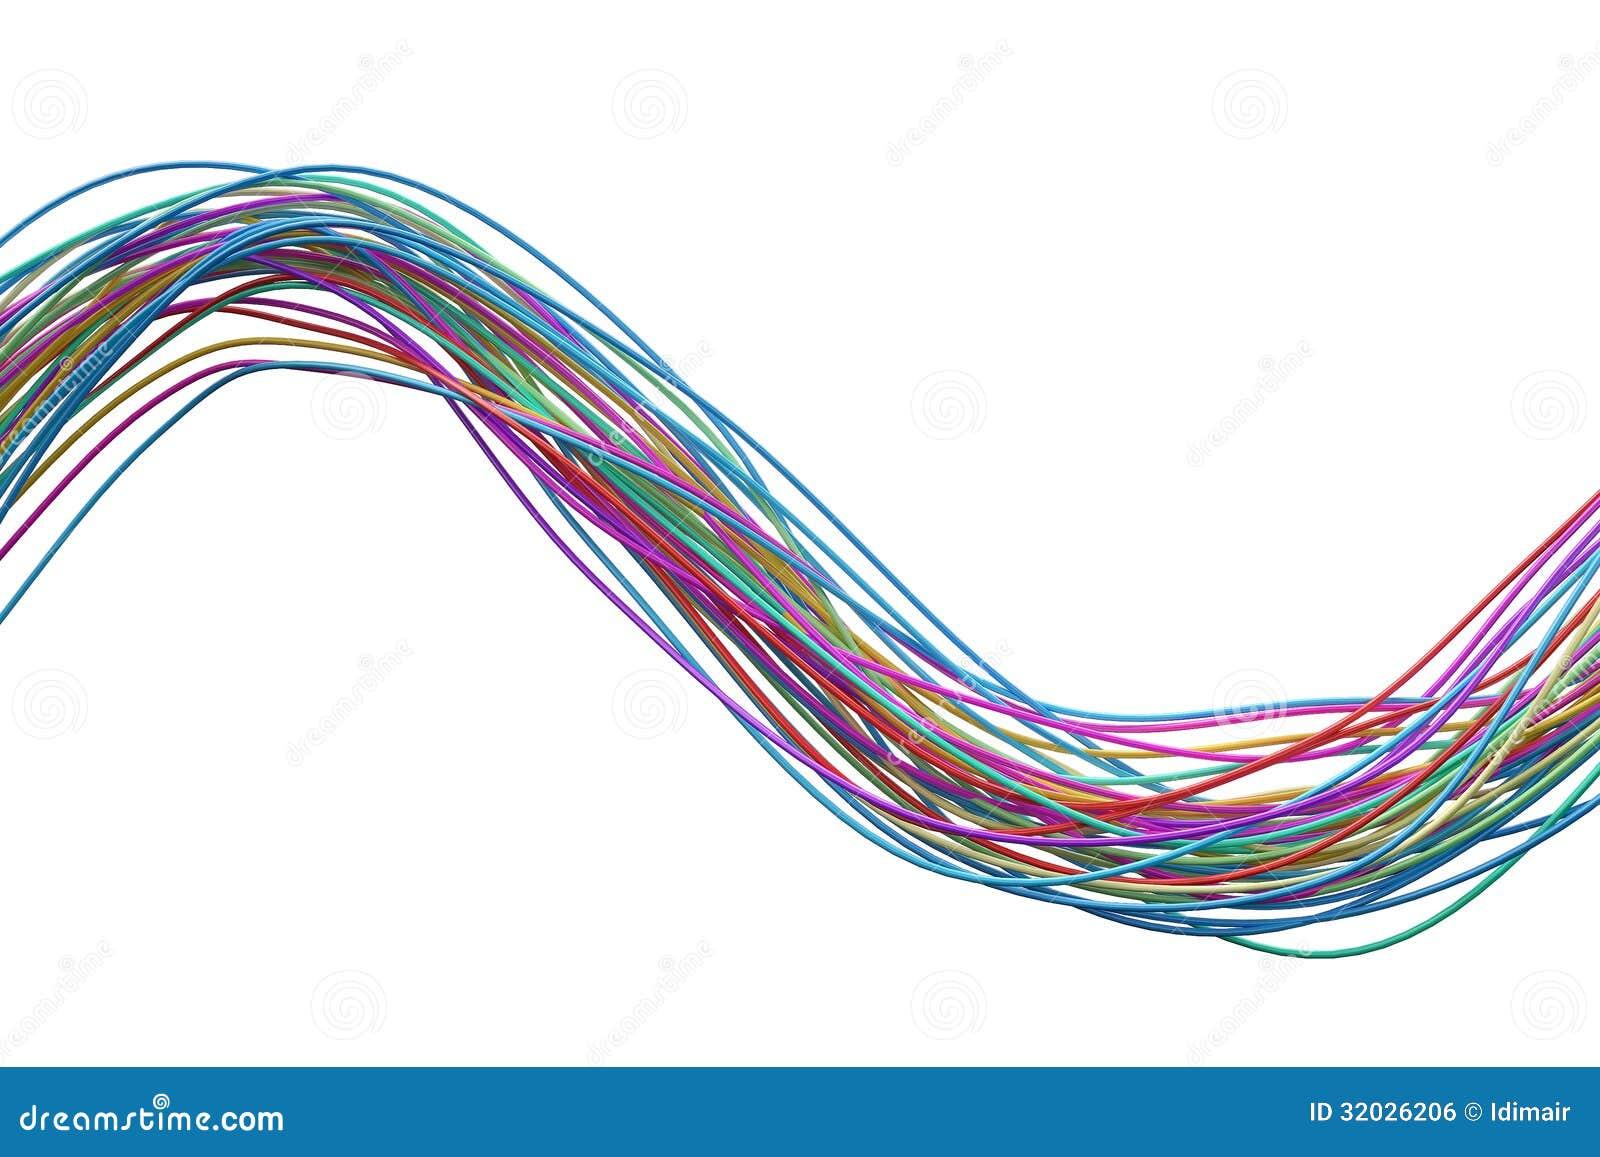 wires stock illustration illustration of blue isolated. Black Bedroom Furniture Sets. Home Design Ideas